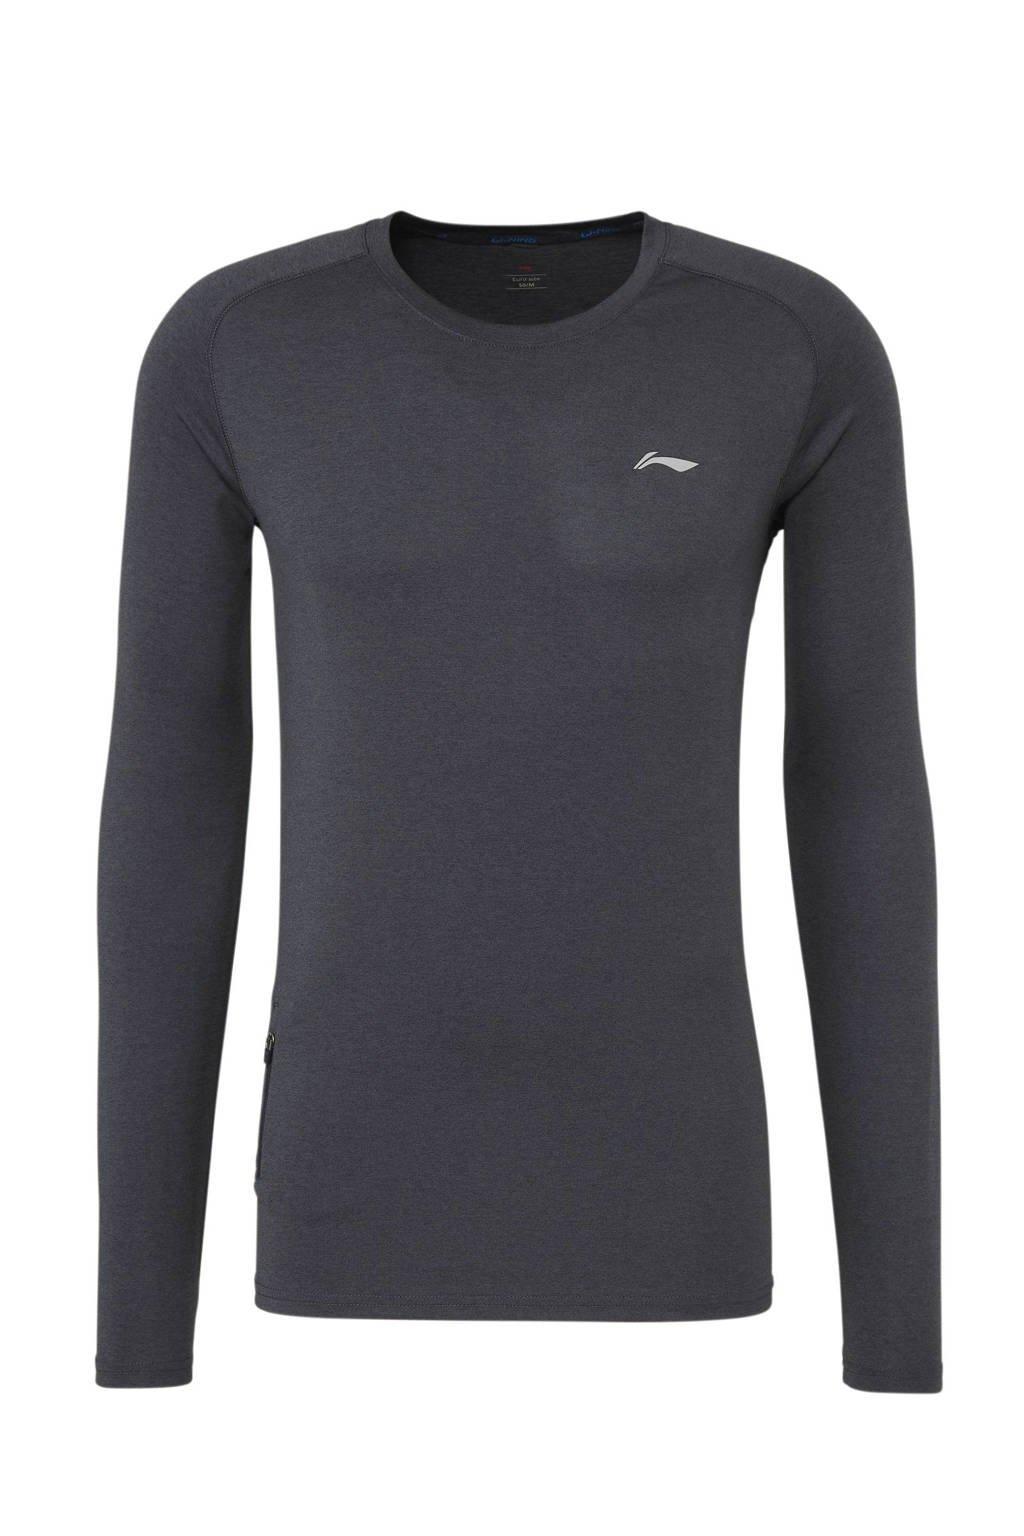 Li-Ning   sport T-shirt grijs, Grijs